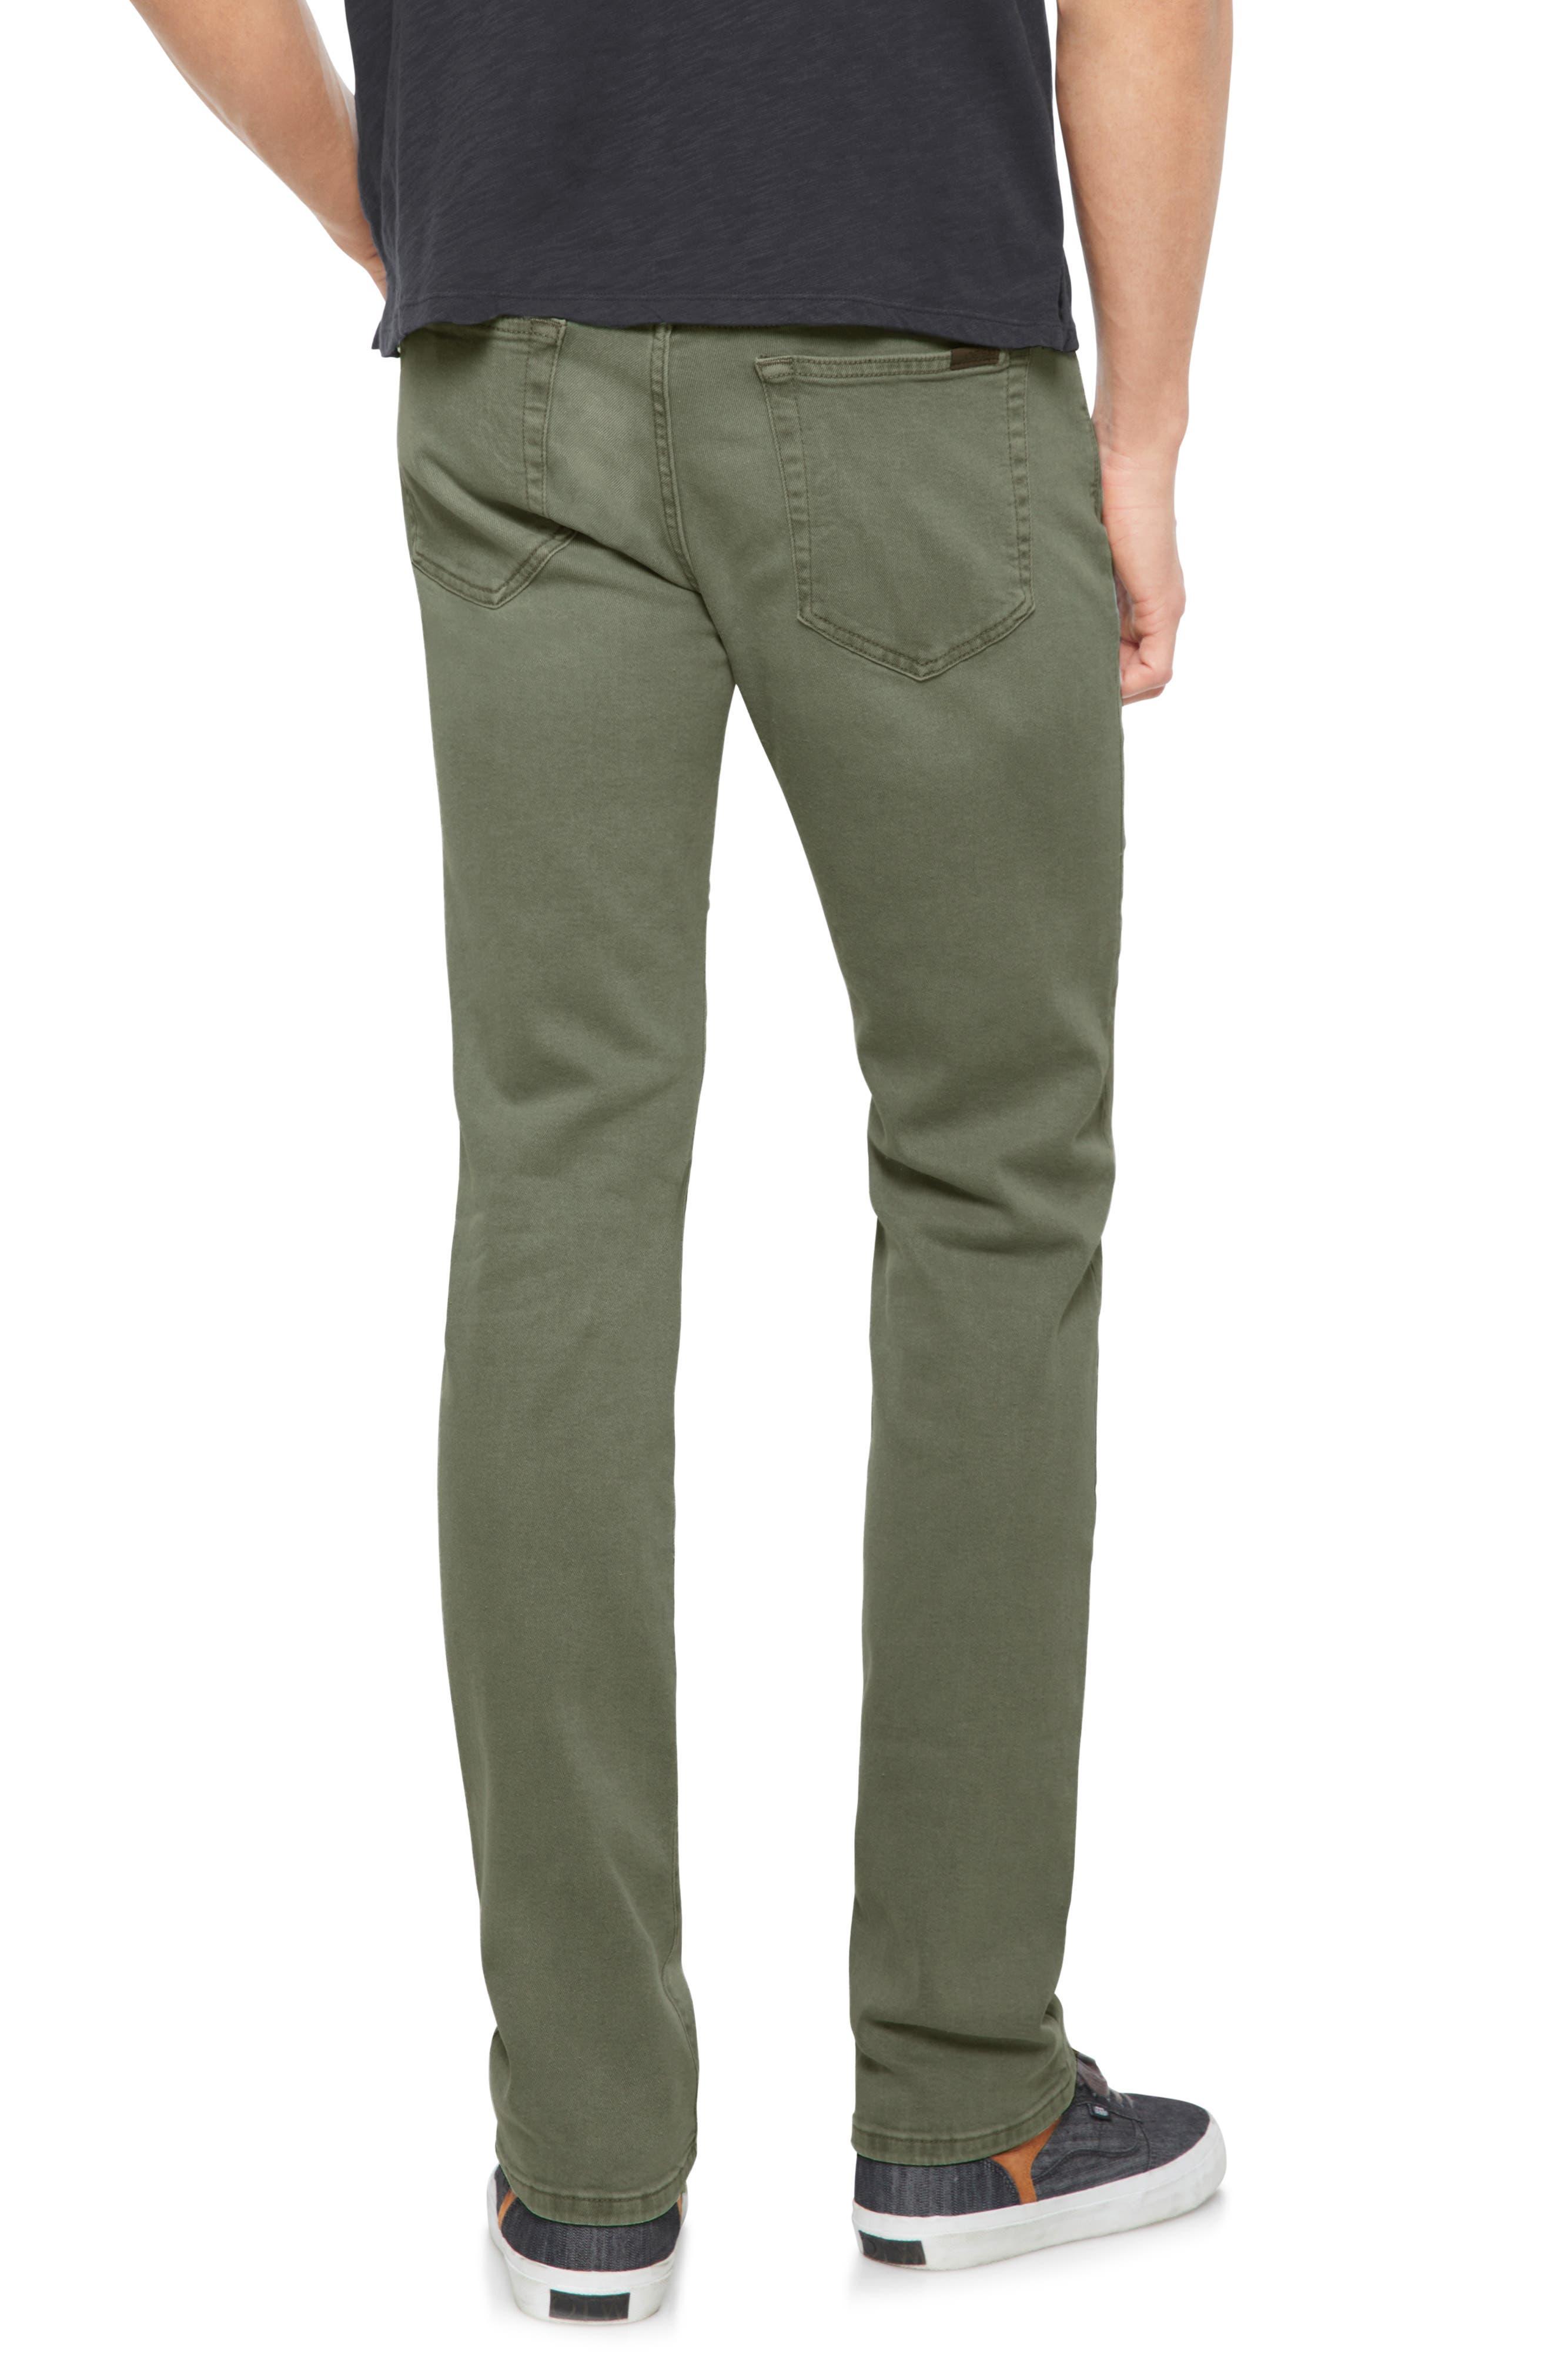 Brixton Slim Straight Leg Jeans,                             Alternate thumbnail 2, color,                             Olive Tree